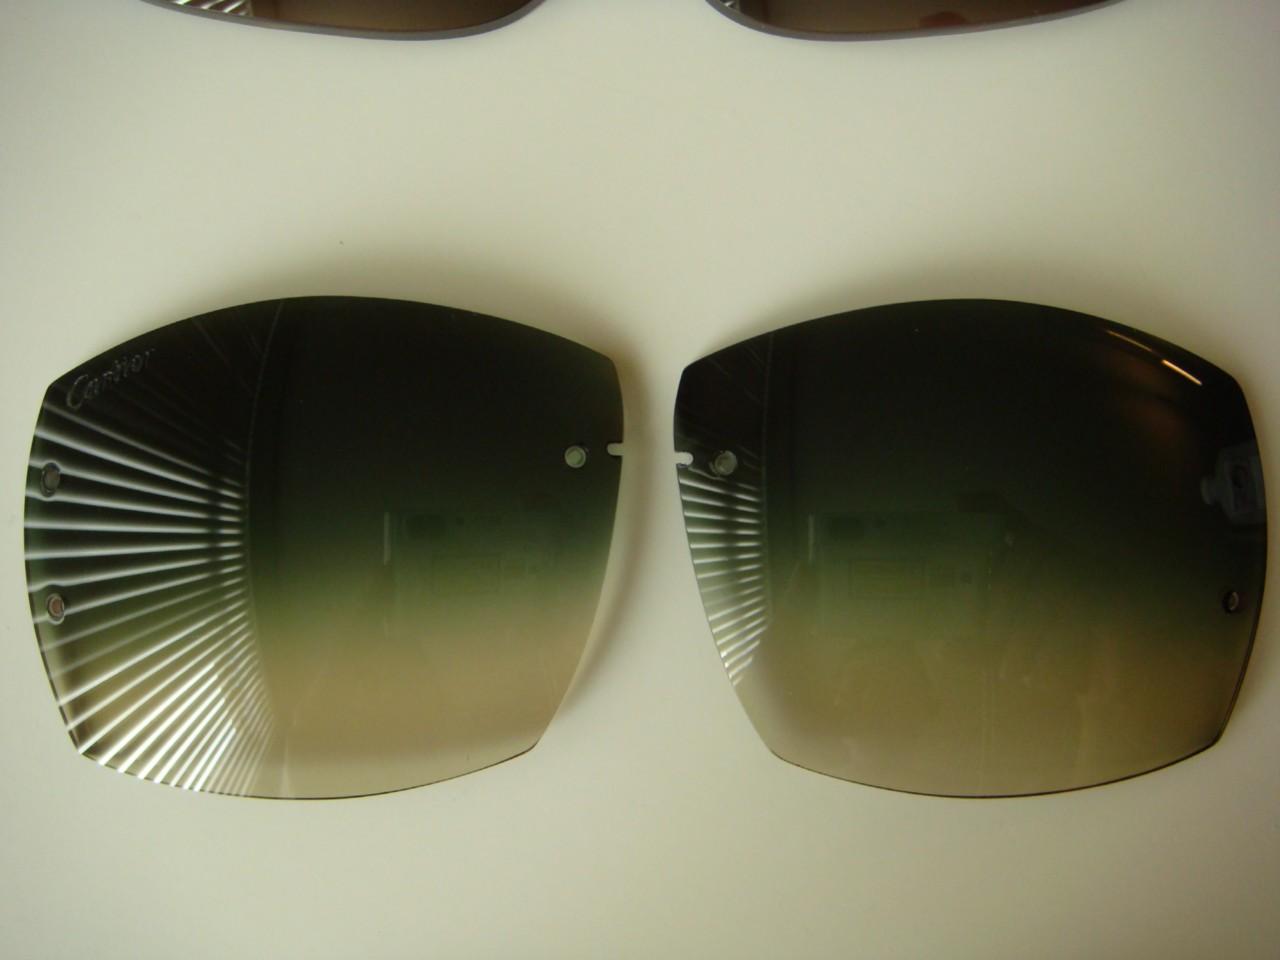 Cartier classic c rimless sunglasses replacement lenses eBay